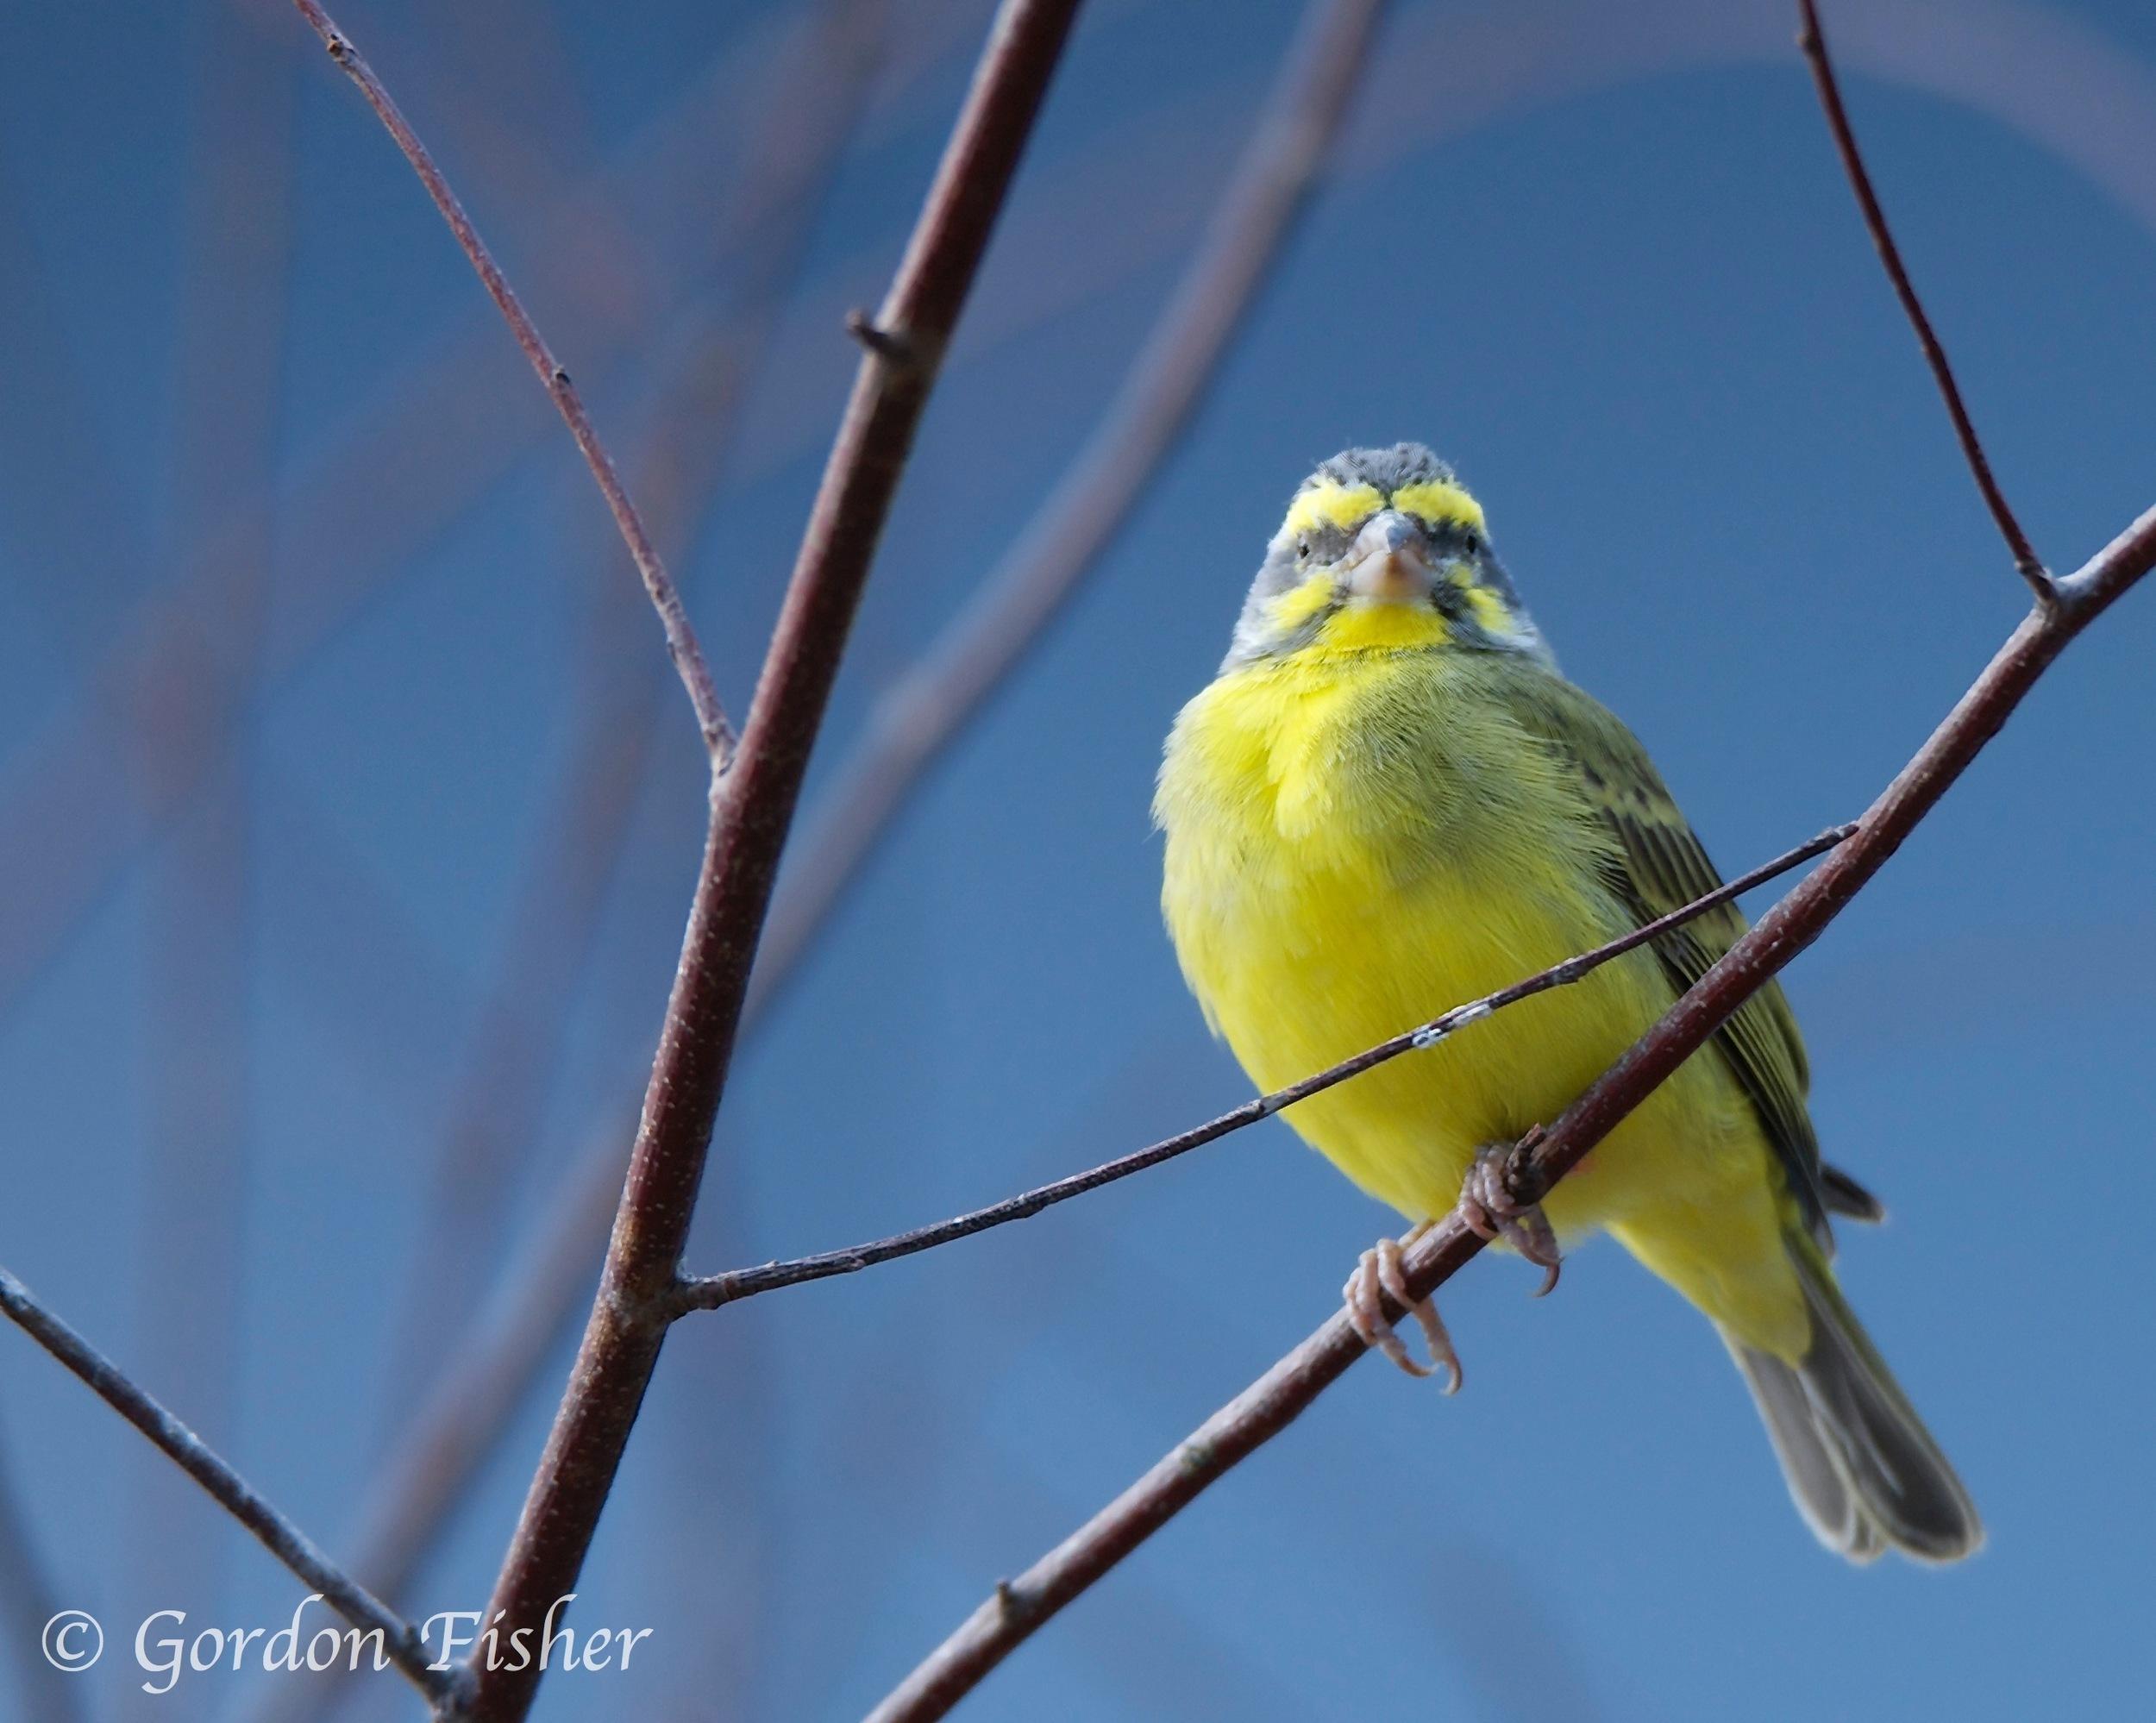 Green Singing Finch